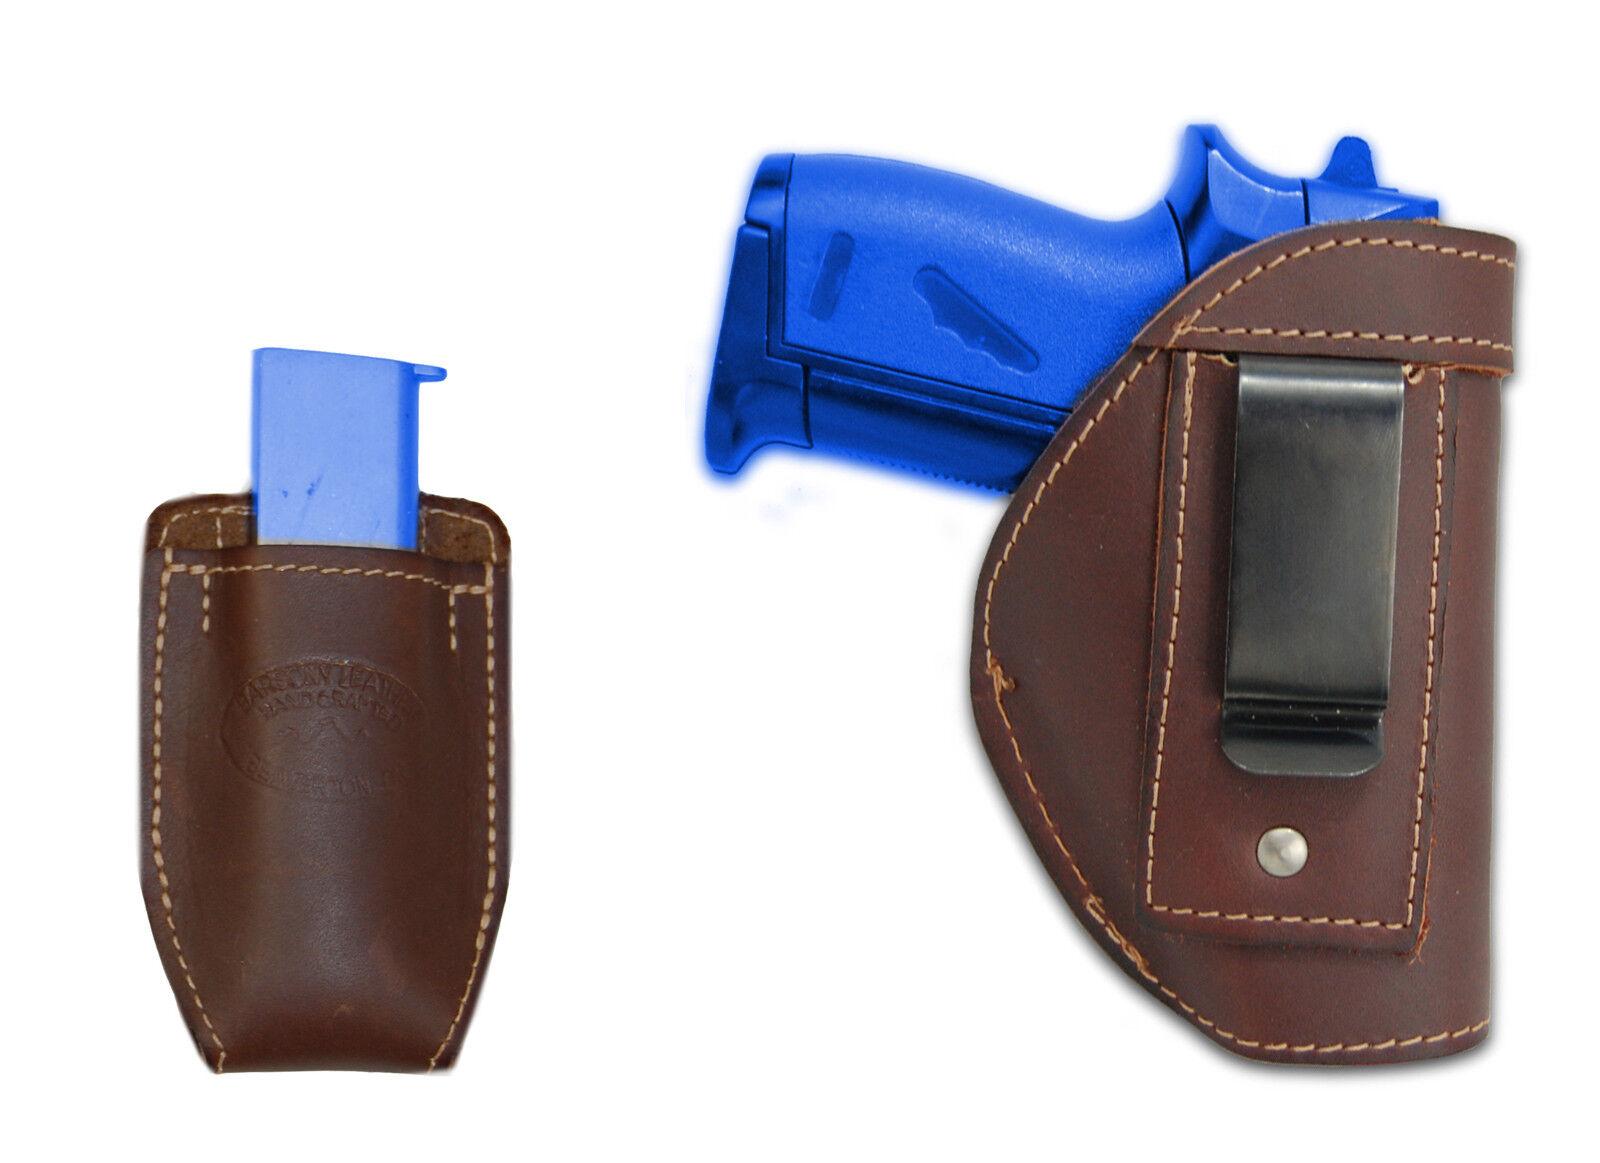 New Barsony Braun Leder IWB Holster + Mag Pouch Smith&Wesson Mini 22 25 380